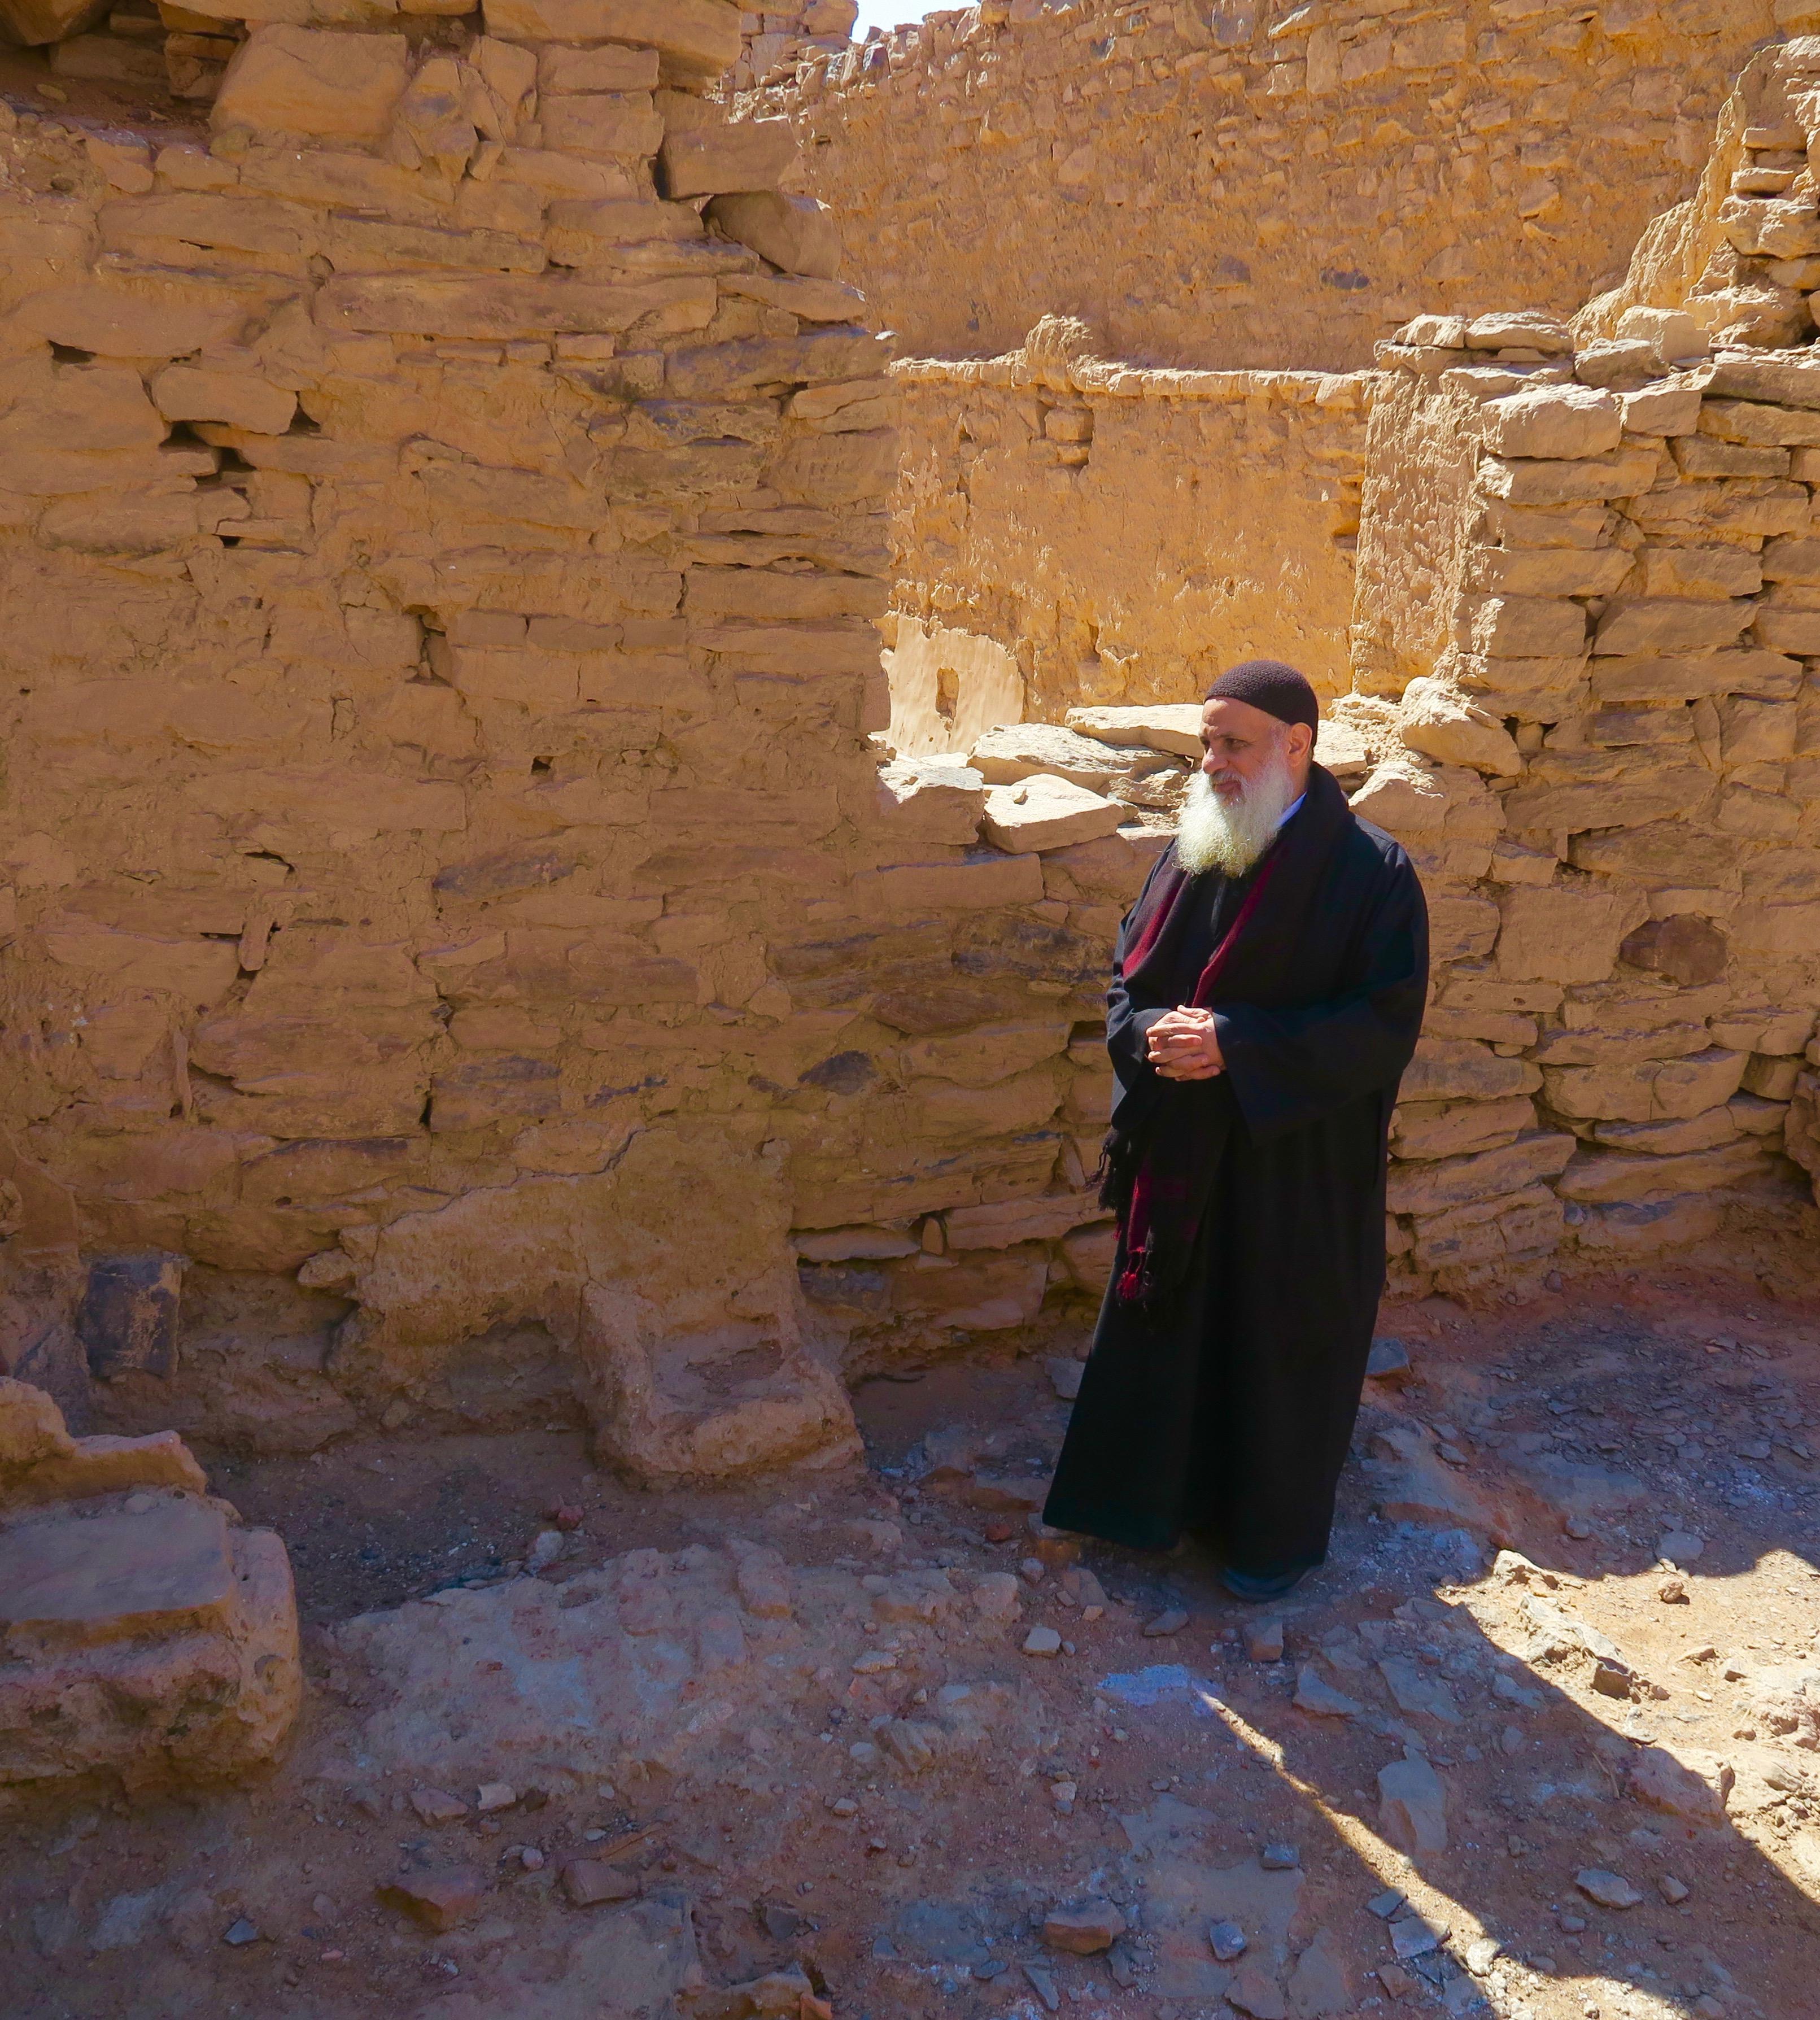 Coptic Monk, St. Simeon Monastery